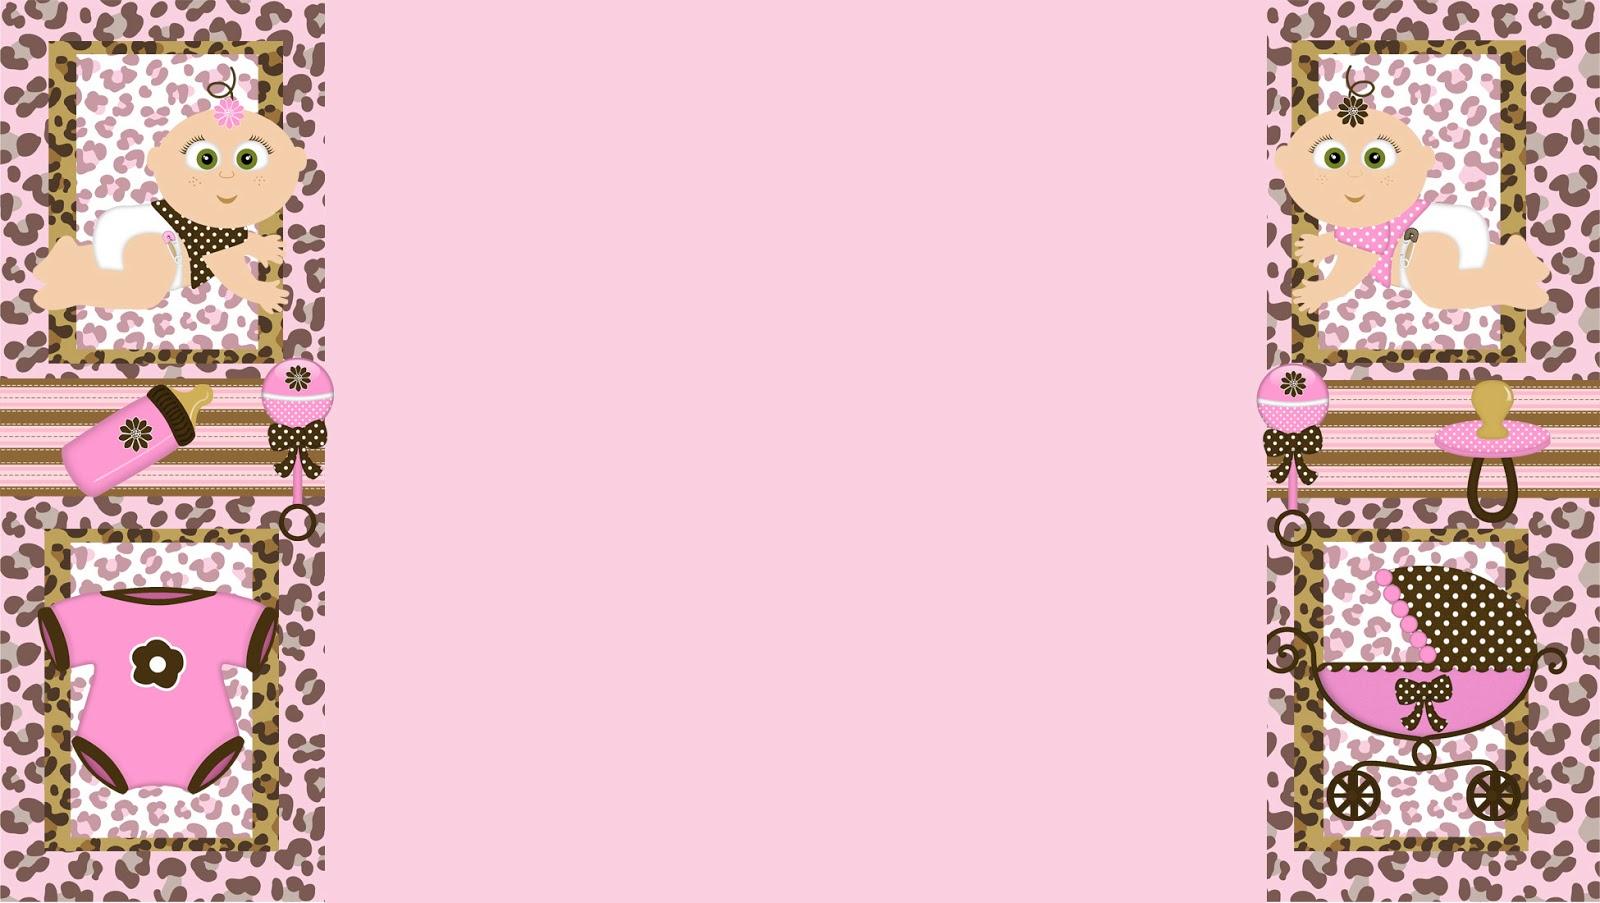 Baby pink cheetah print background - photo#26